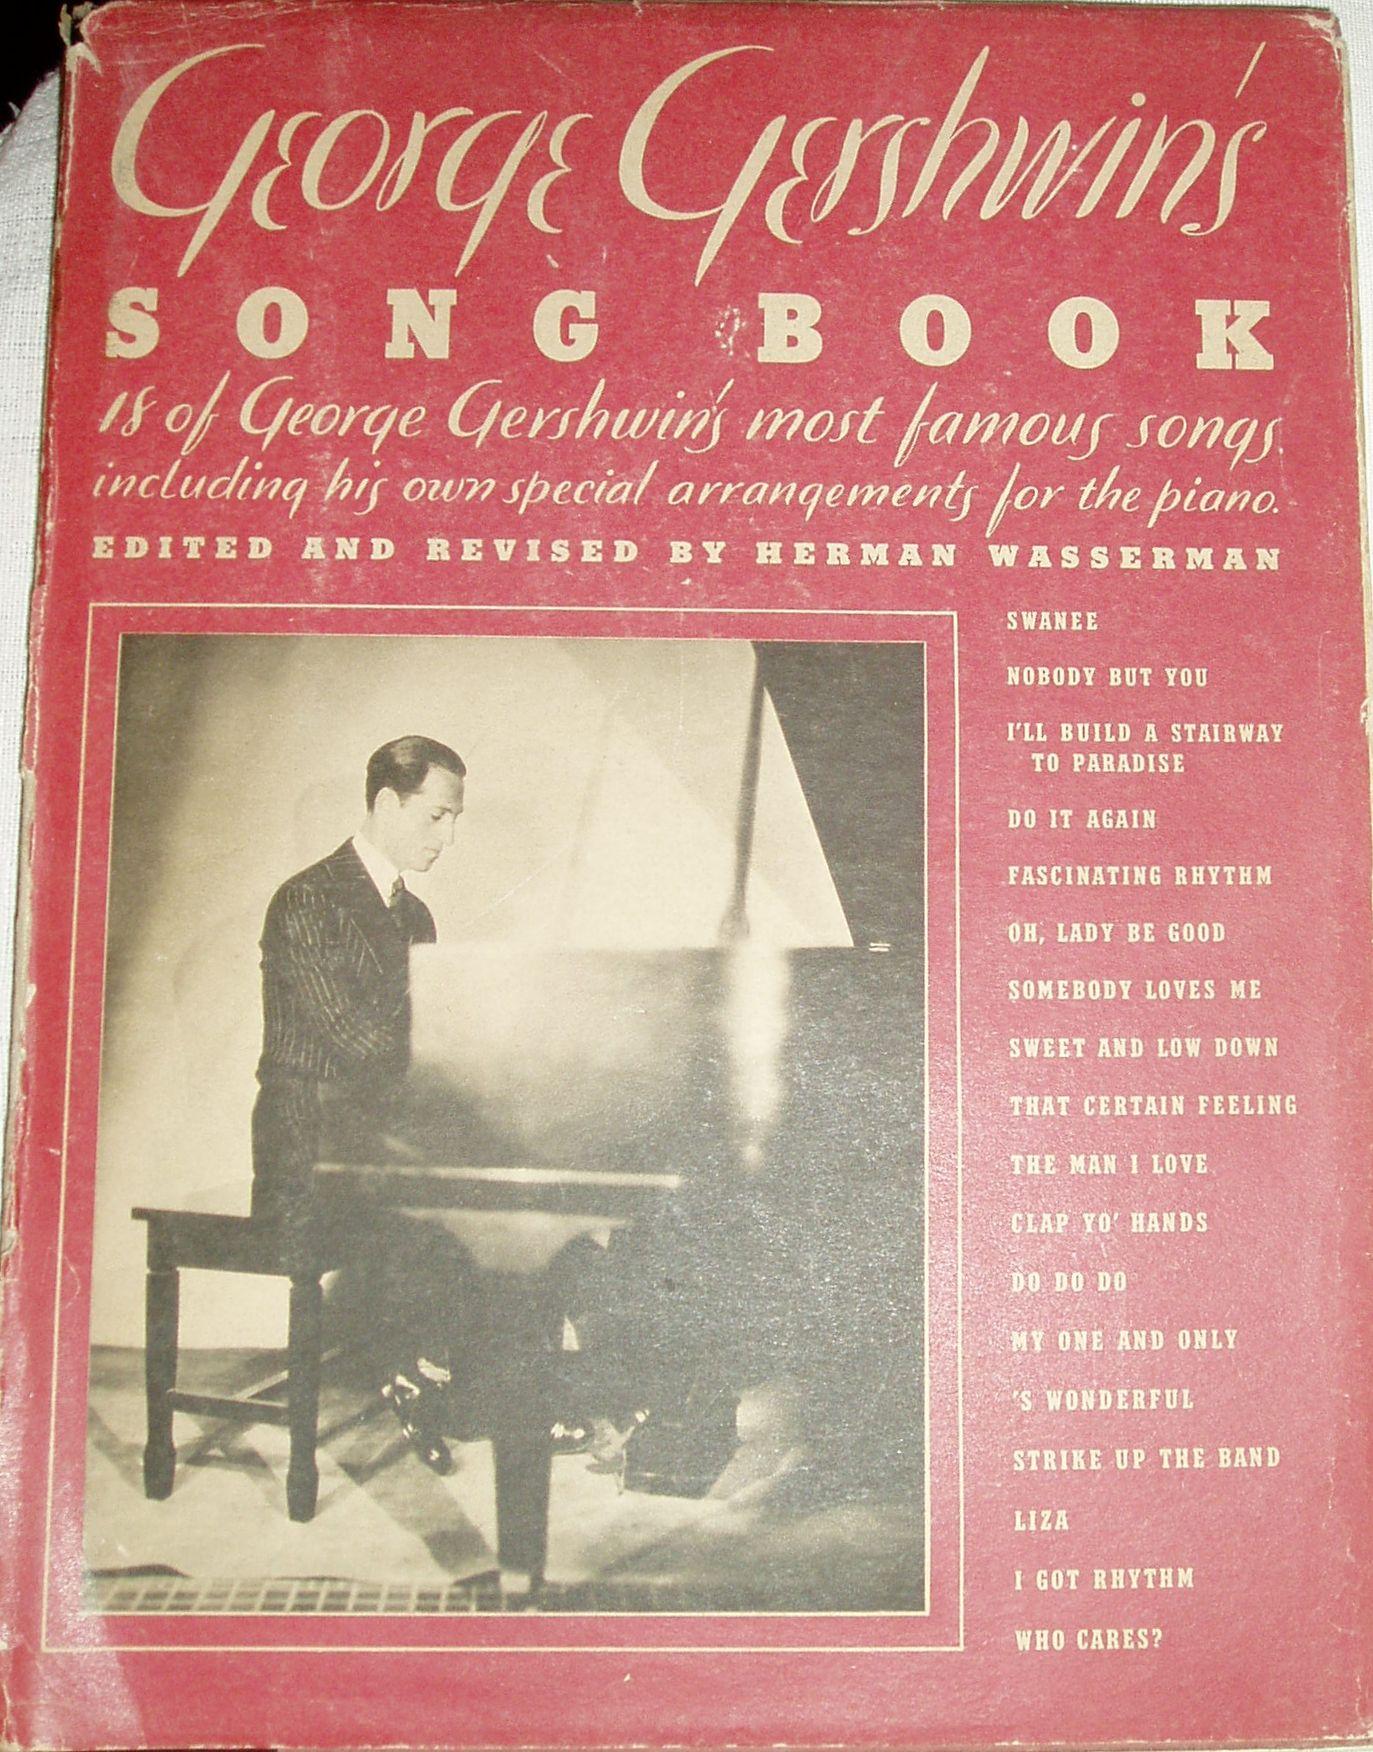 George Gershwin's song book